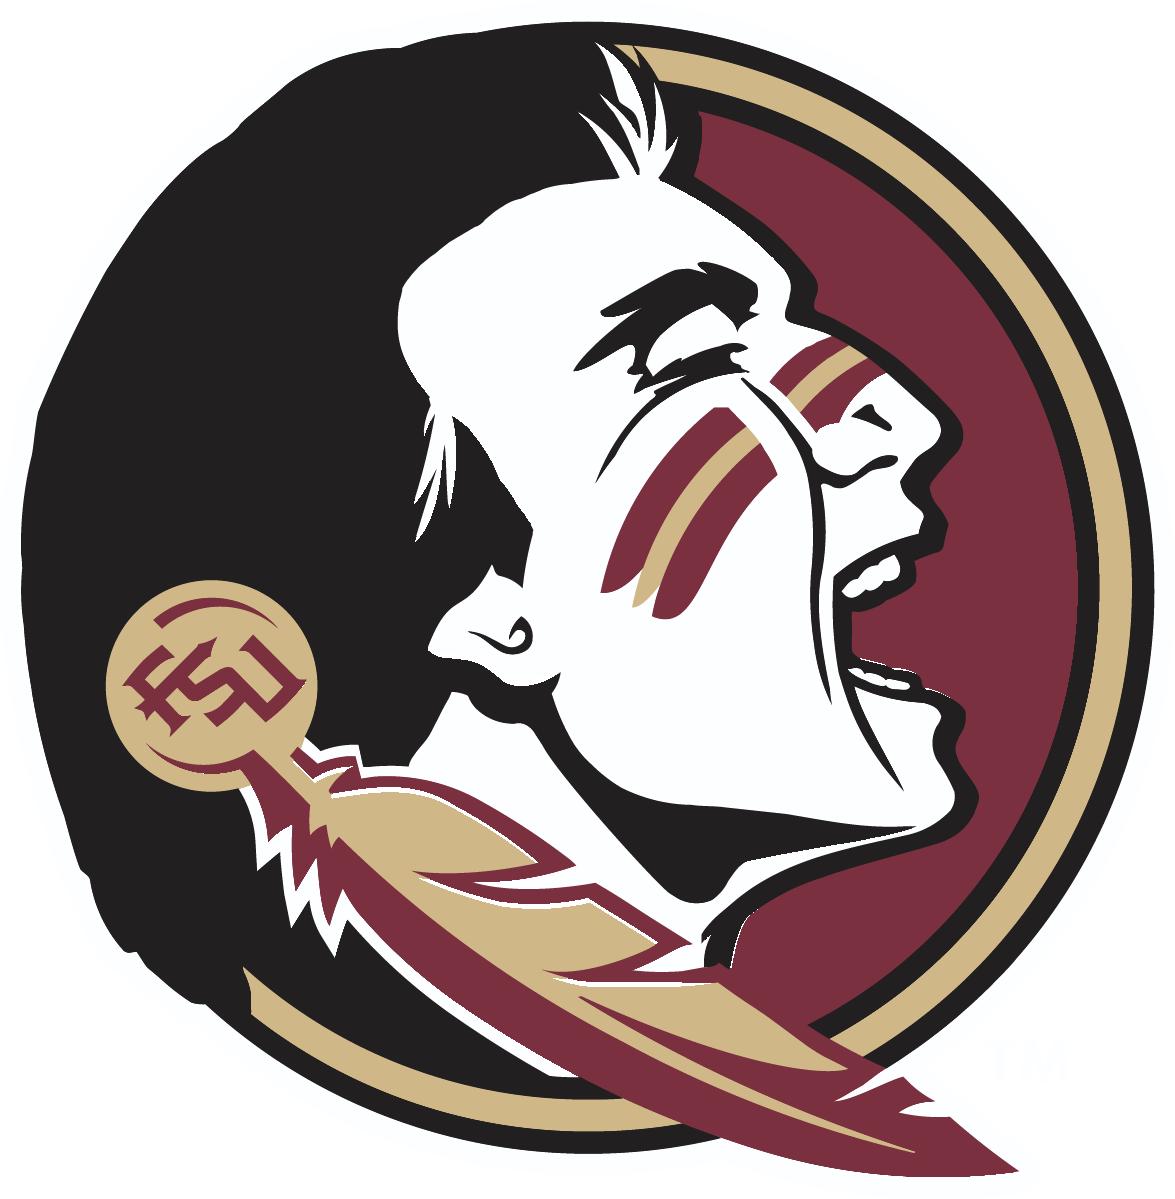 Fsu Logo Florida State Seminoles Florida State Football Florida State Seminoles Florida State Seminoles Logo